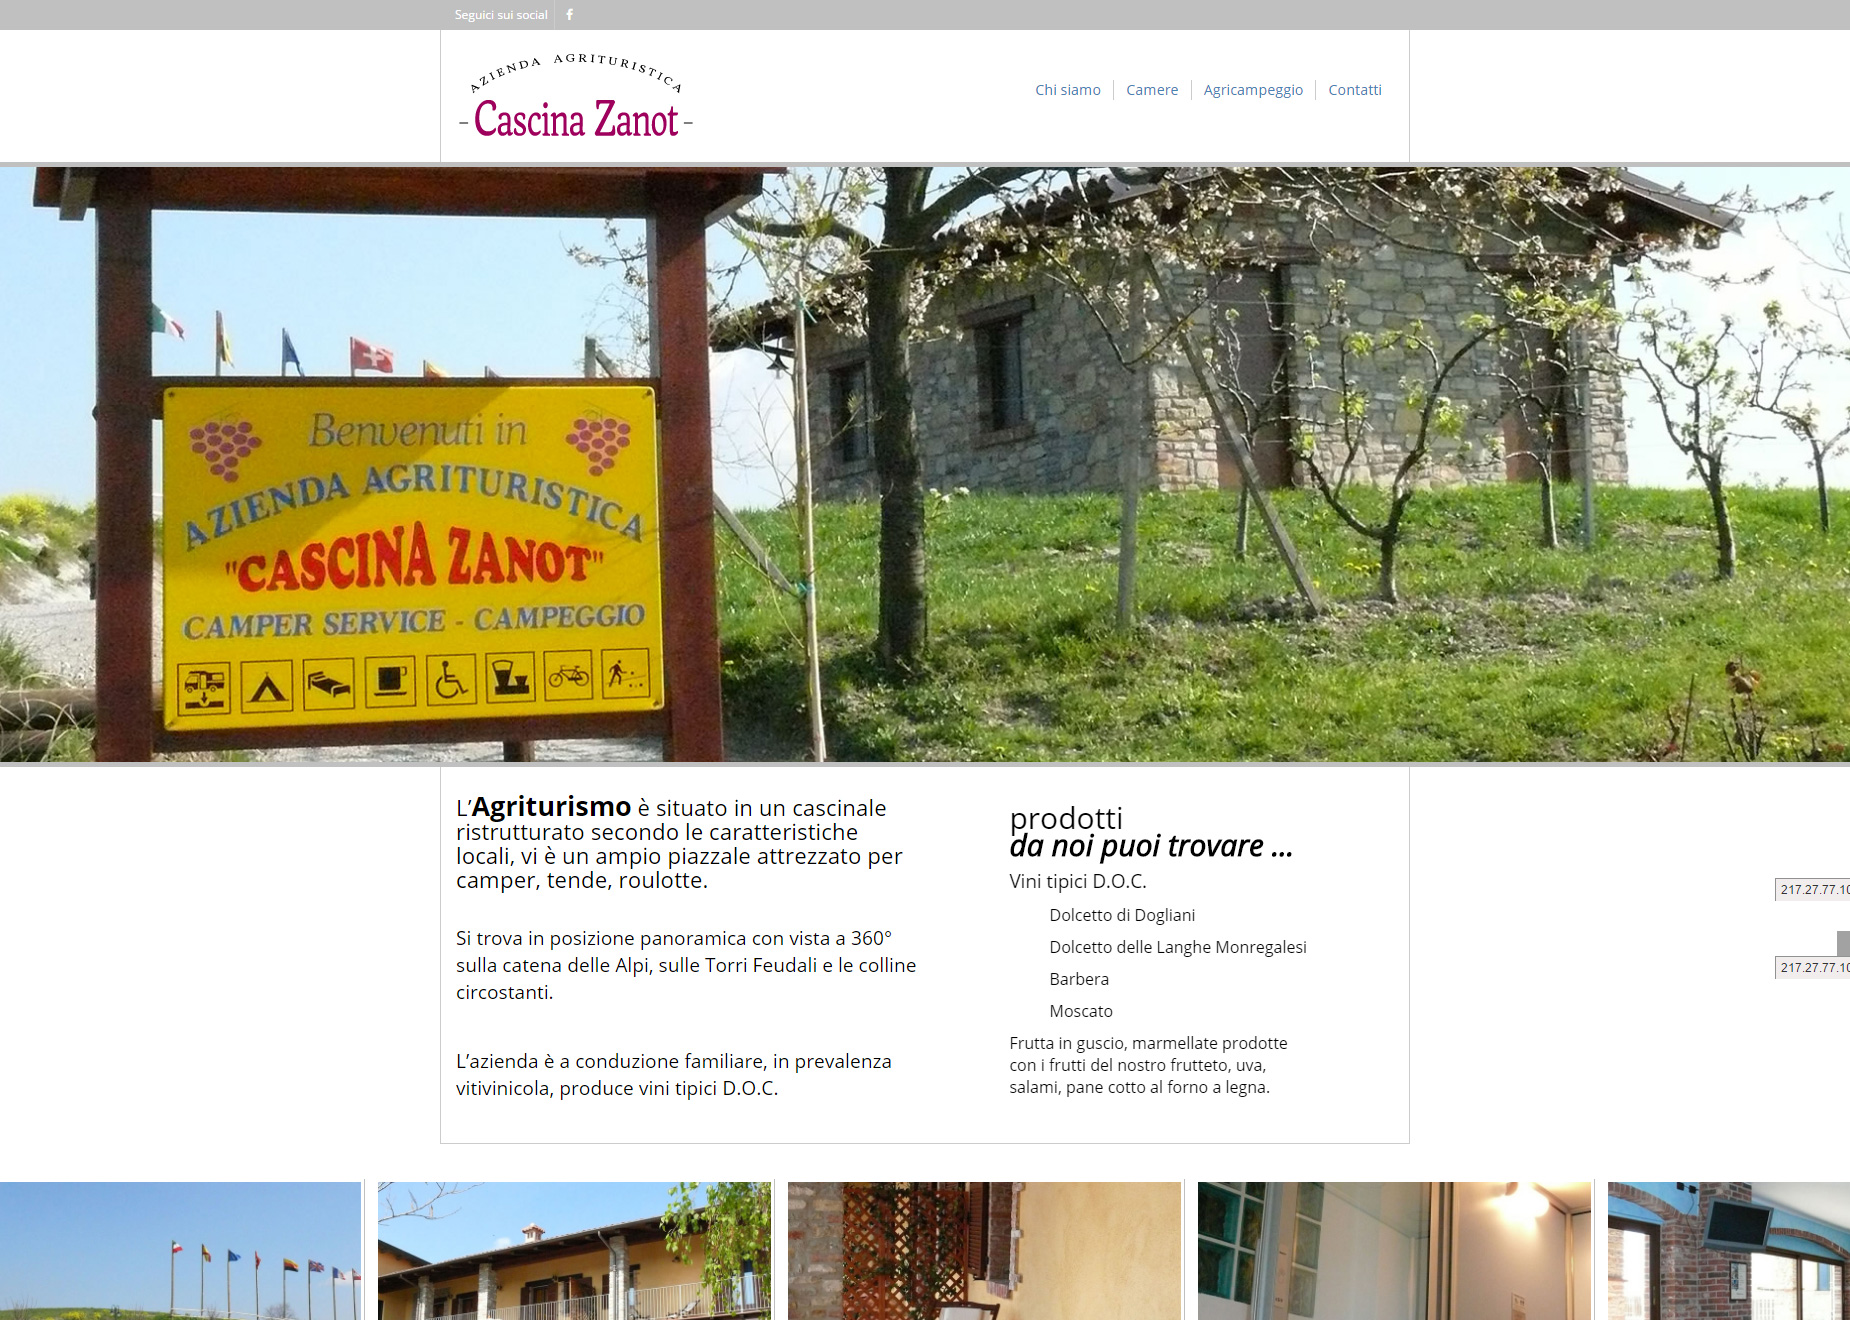 AGRITURISMO CASCINA ZANOT